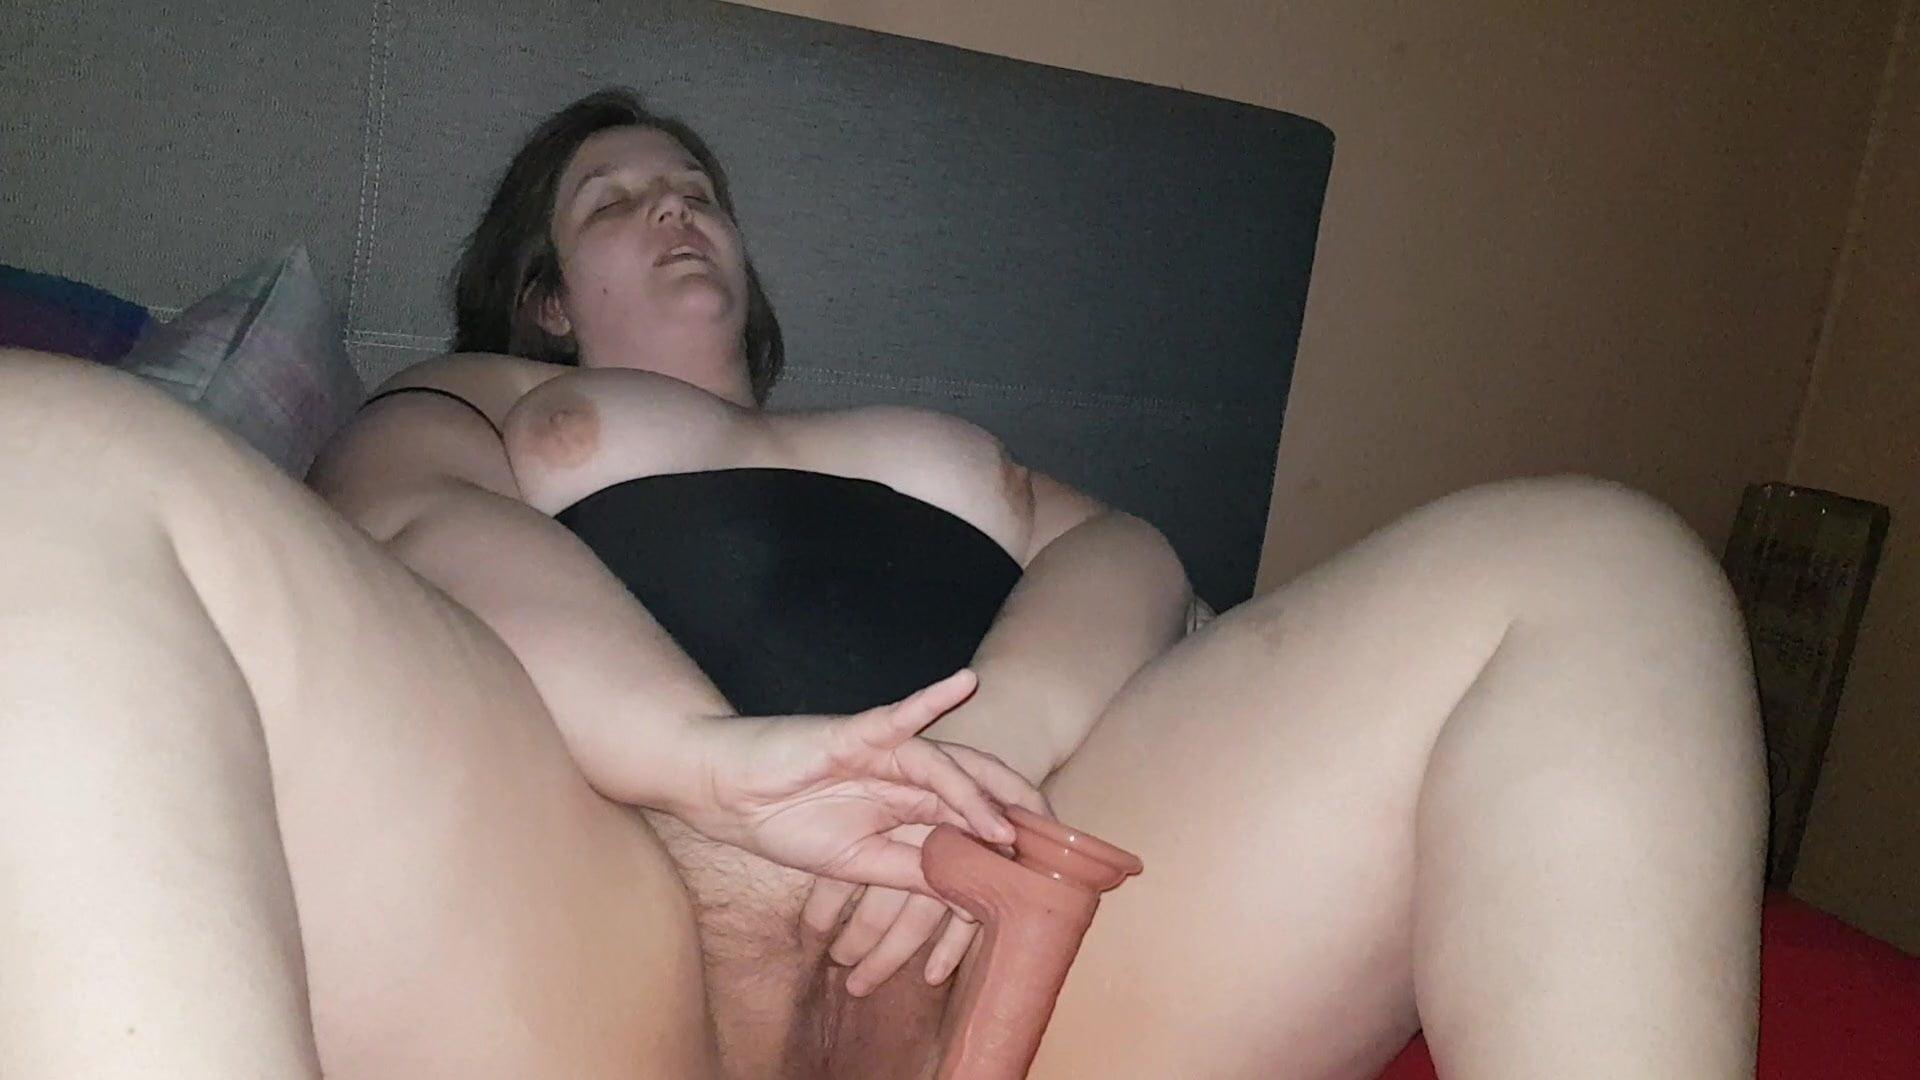 Hot naked lesbians group sex